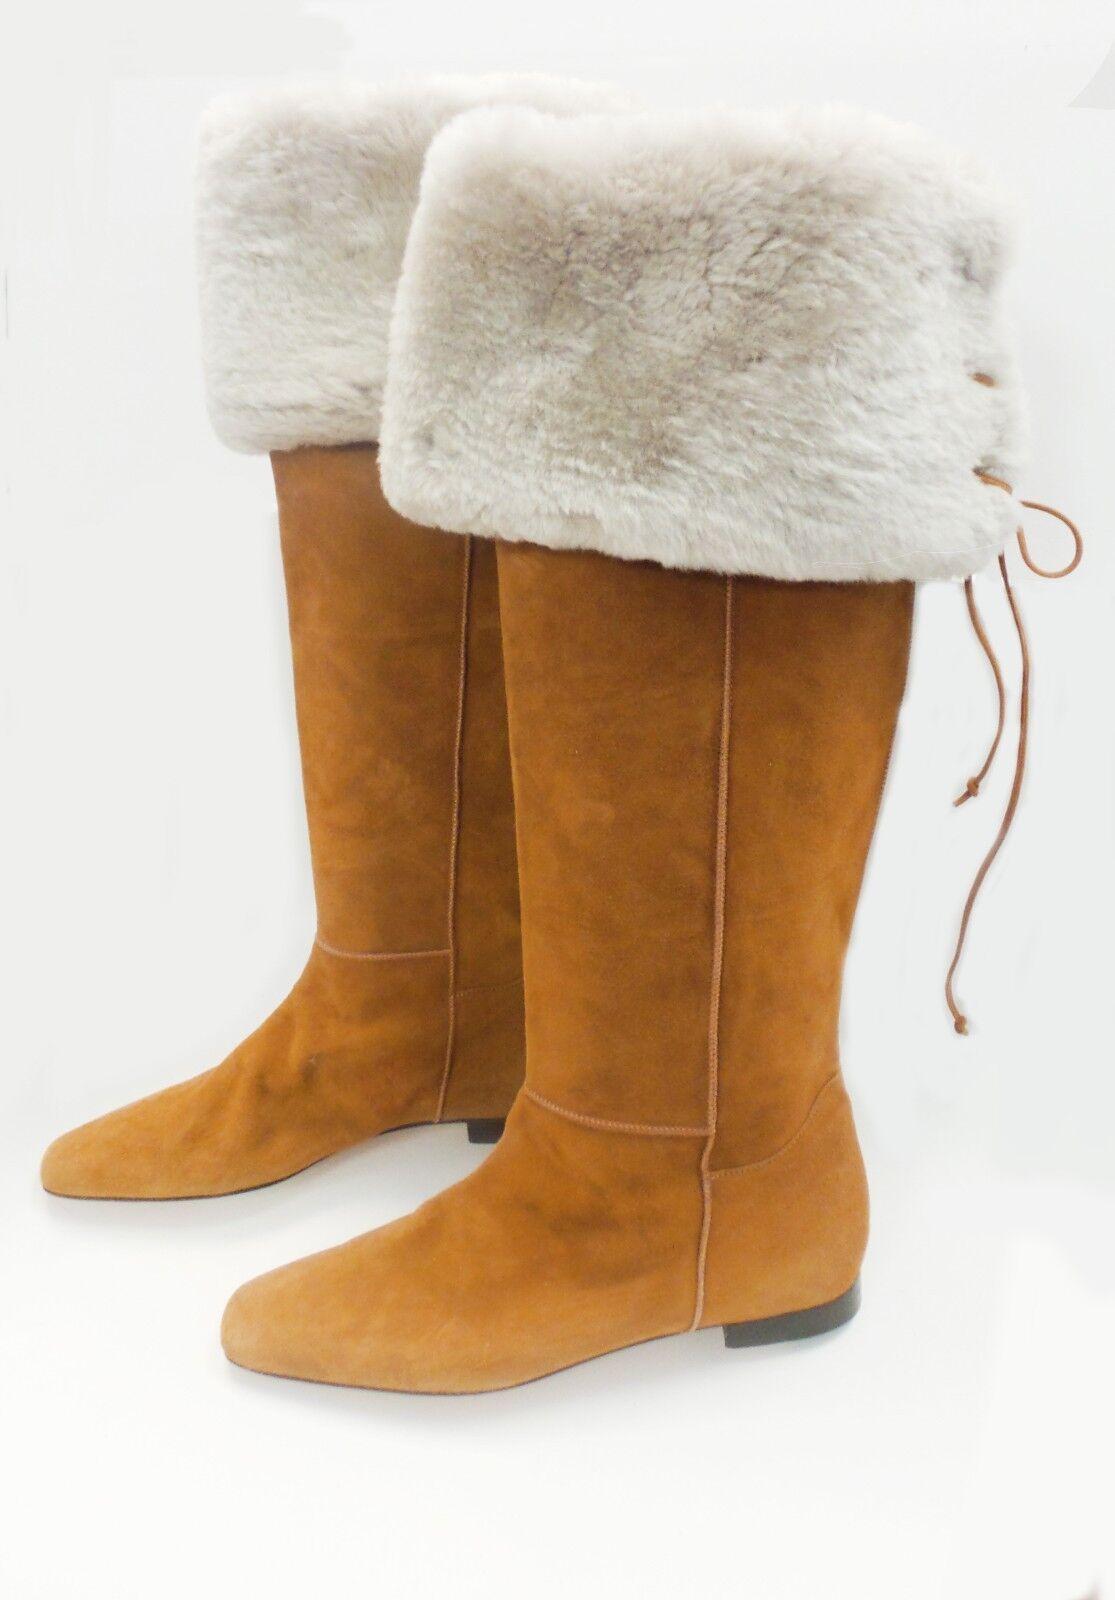 forniamo il meglio Manolo Blahnik   Suede Suede Suede Knee stivali Dimensione EU 39.5  design unico